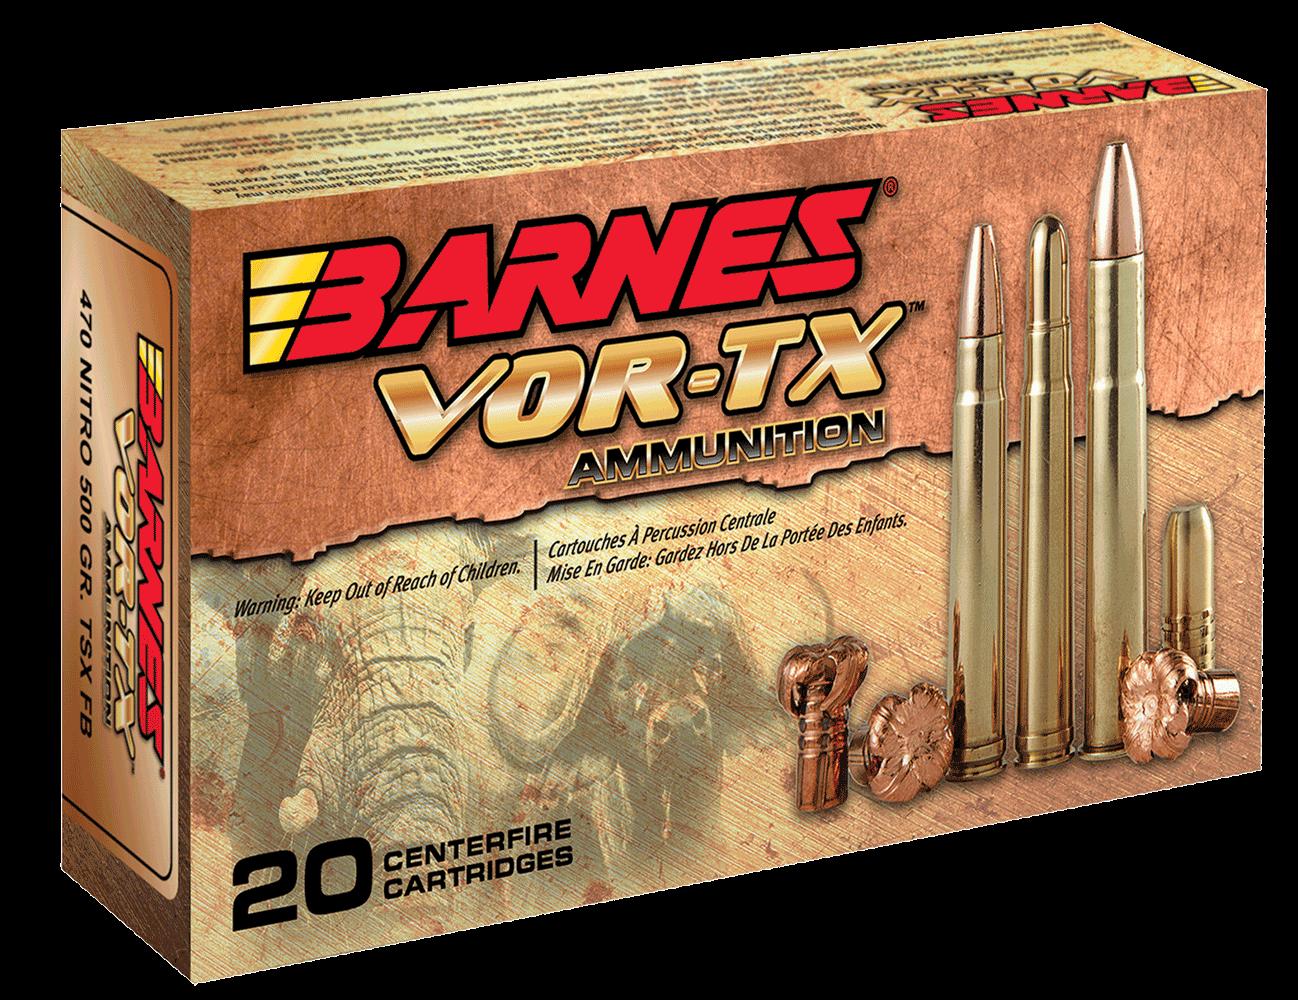 Barnes Bullets 22008 VOR-TX Rifle 22-250 Rem 50 gr TSX ...